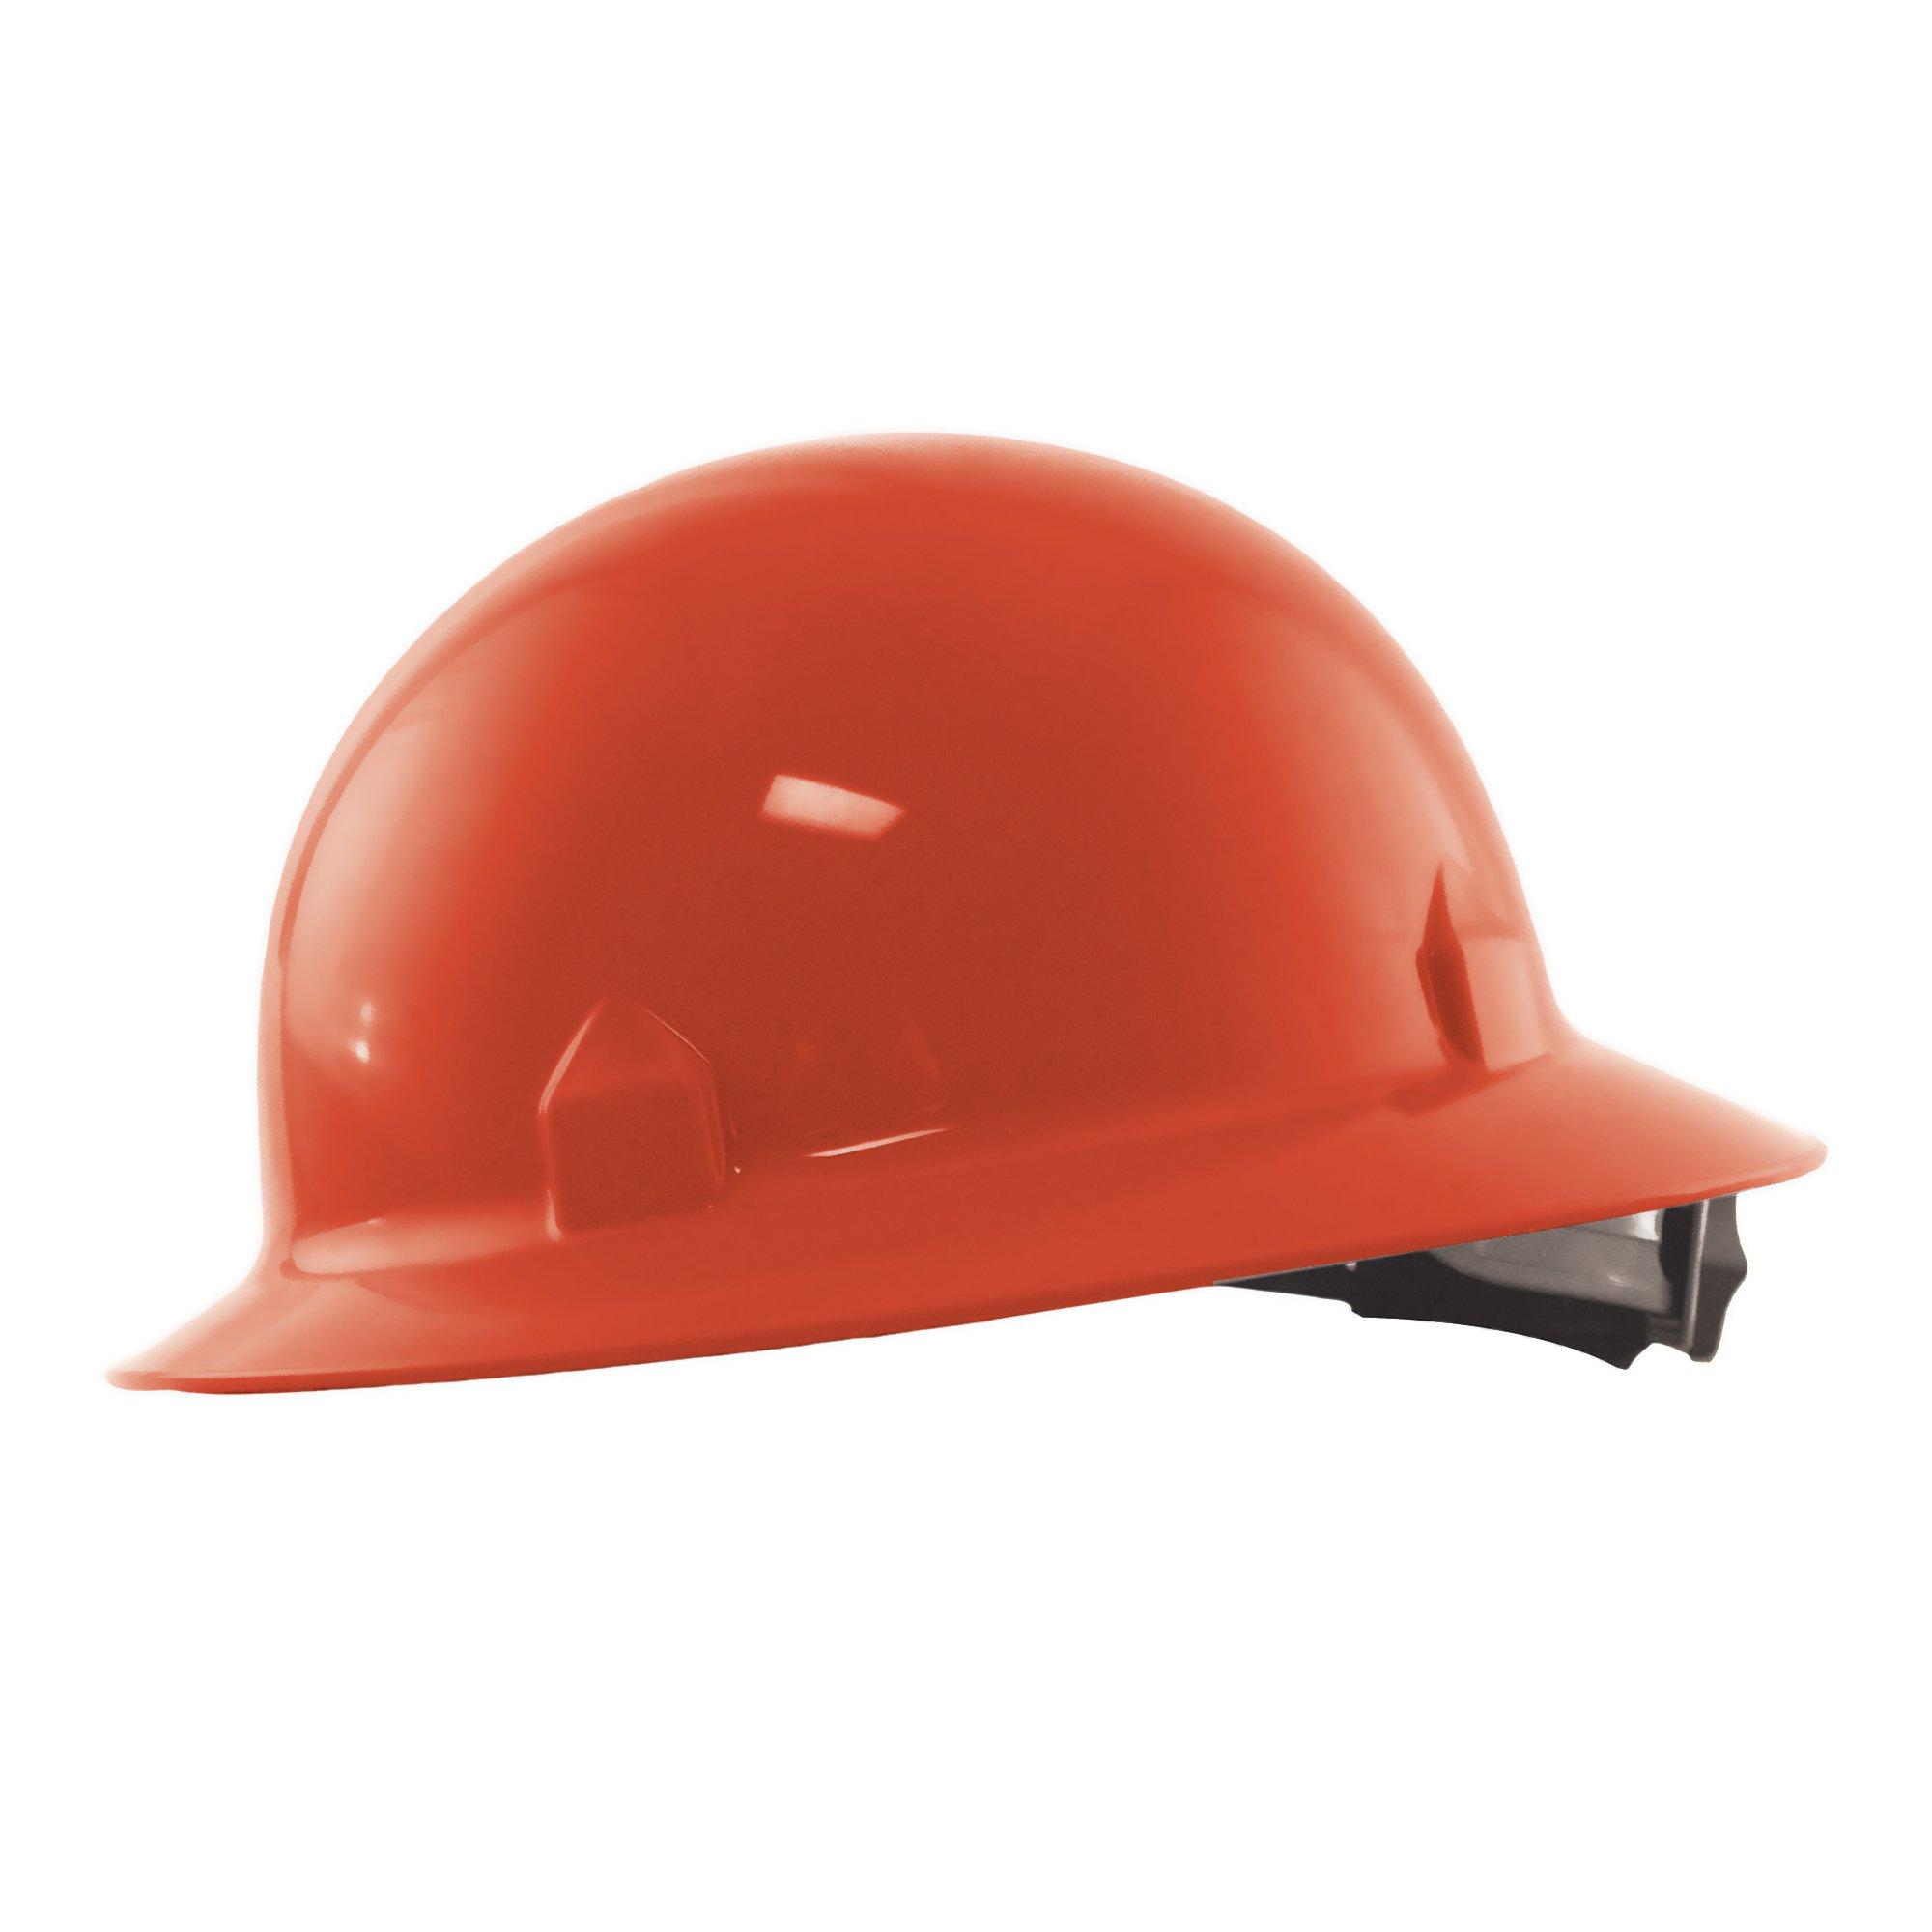 Jackson Safety Blockhead Full Brim Hard Hat (20702), 360-Degree Brim, 8-Point Ratchet Suspension, Red, 12/ Case